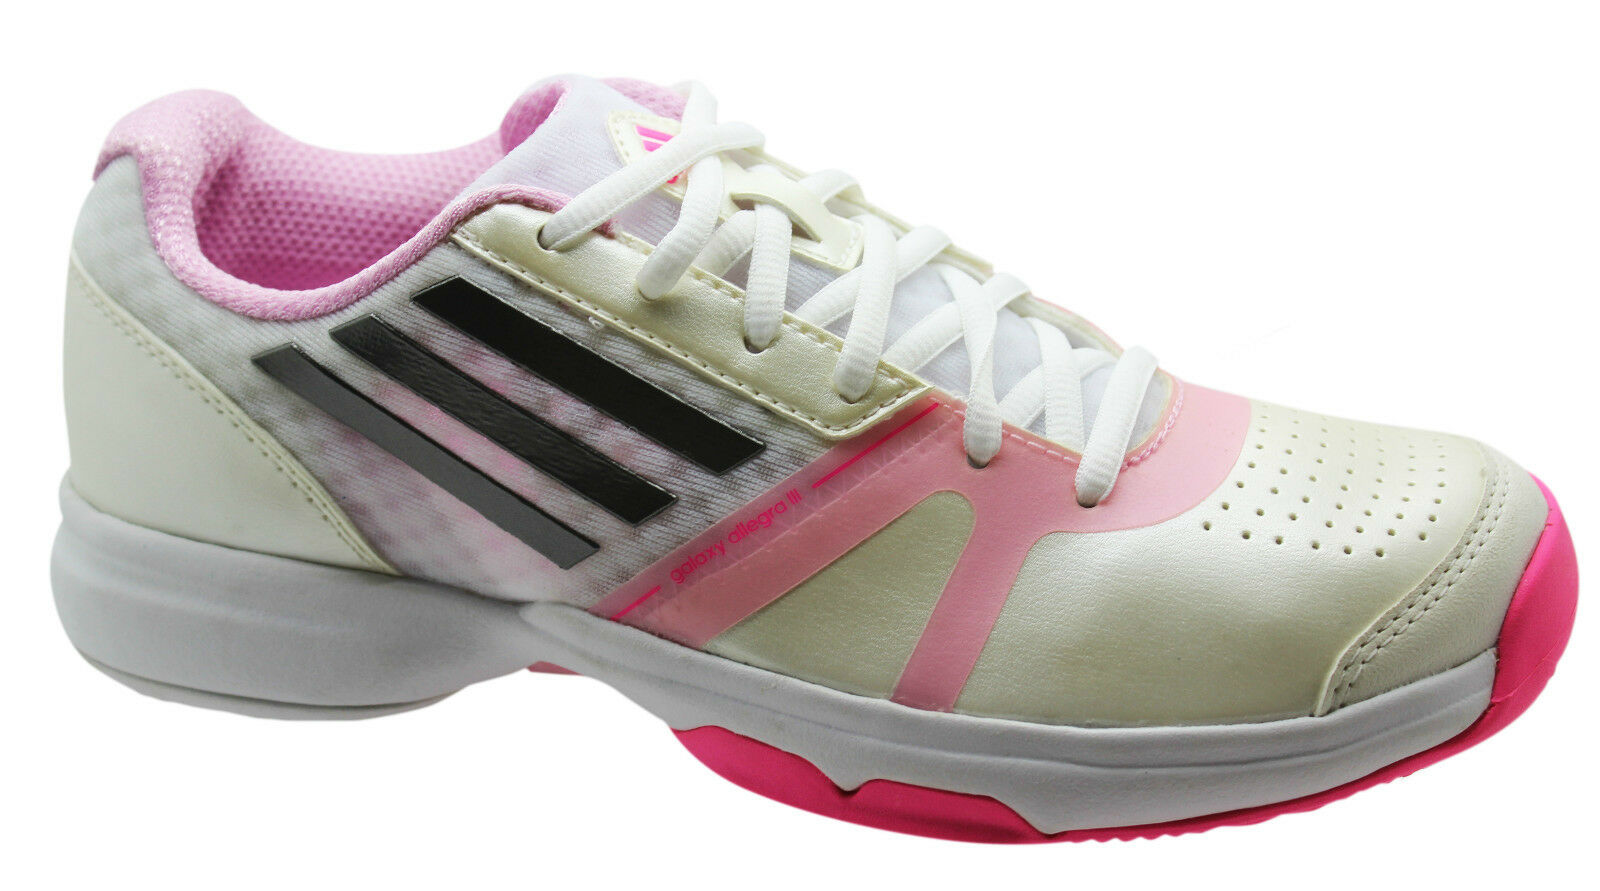 Adidas Sports Galaxy Allegra III Womens Trainers Tennis Shoes Lace Up M19766 U39